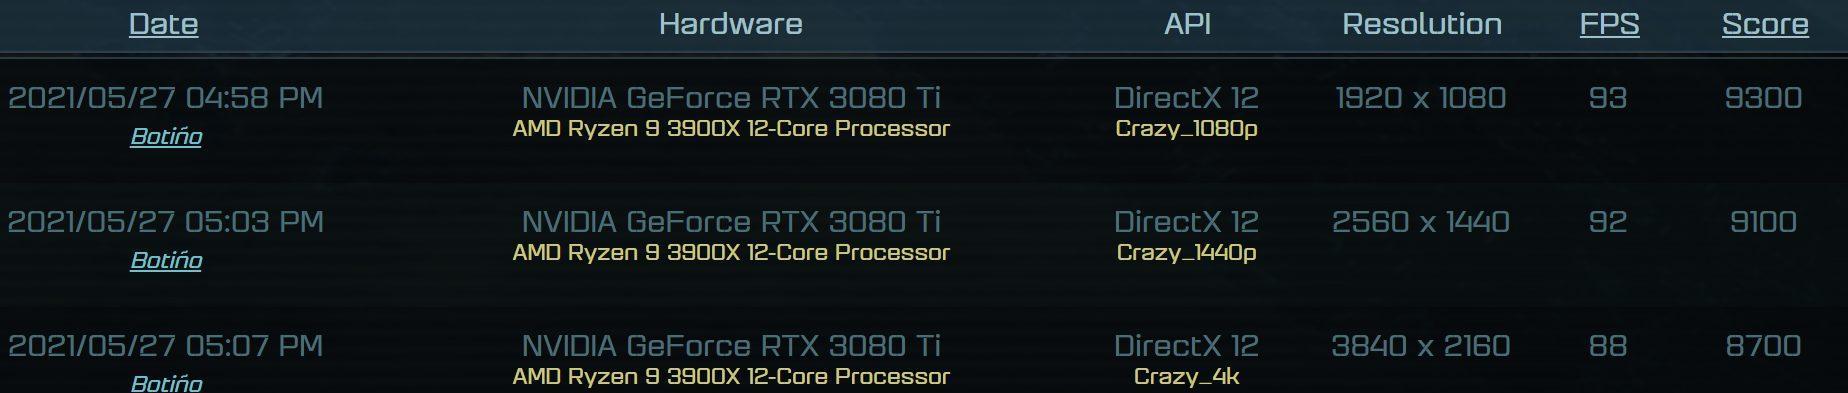 AOTS-RTX-3080-Ti